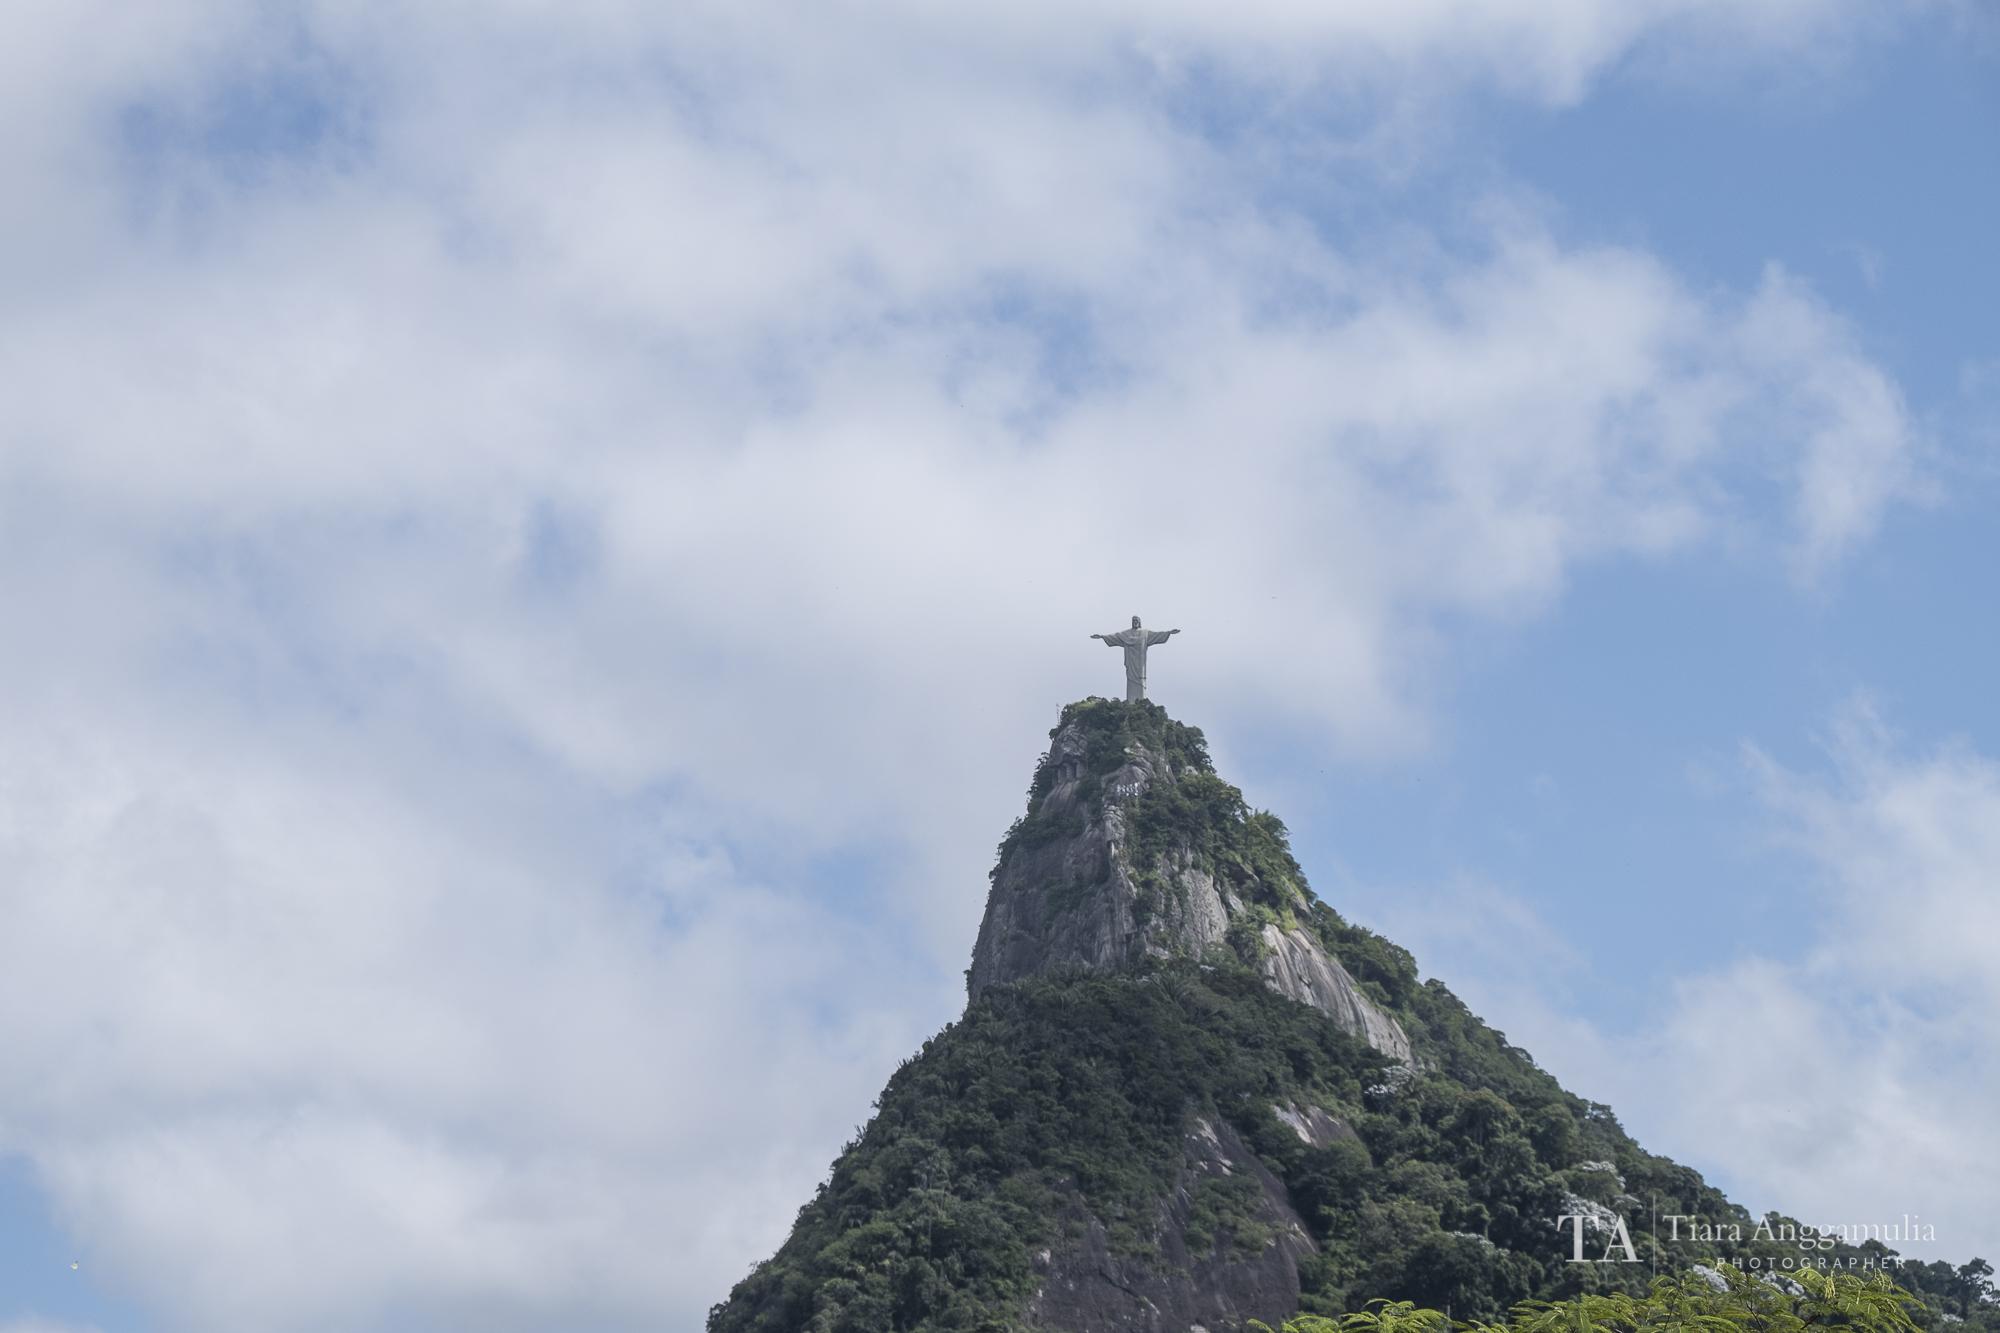 Rio 011.jpg